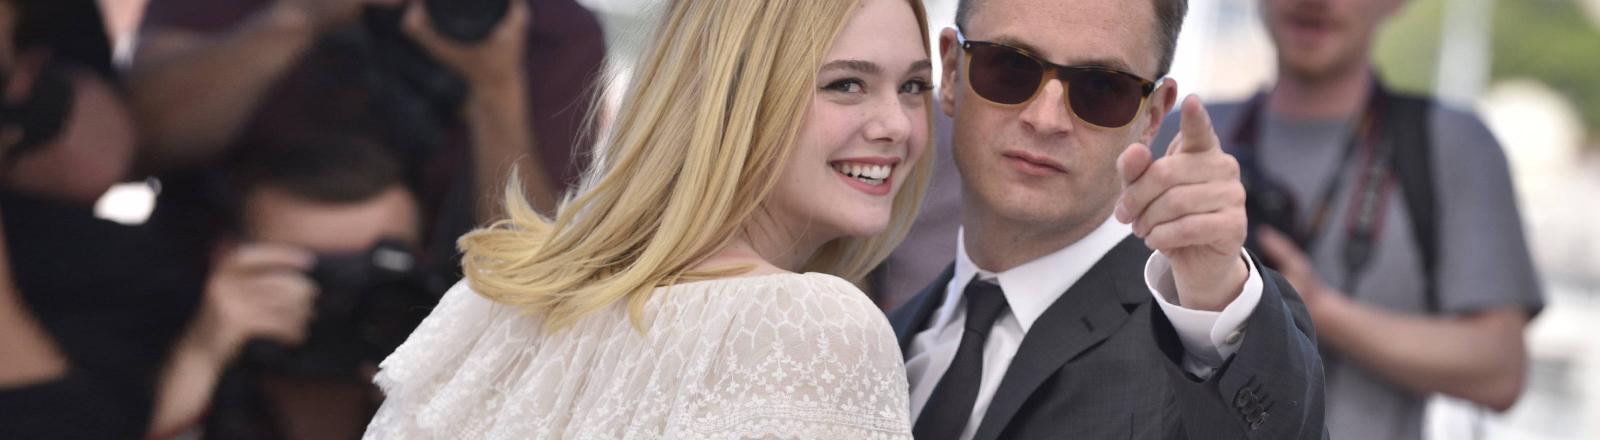 Elle Fanning steht neben Regisseur Nicolas Winding Refn.